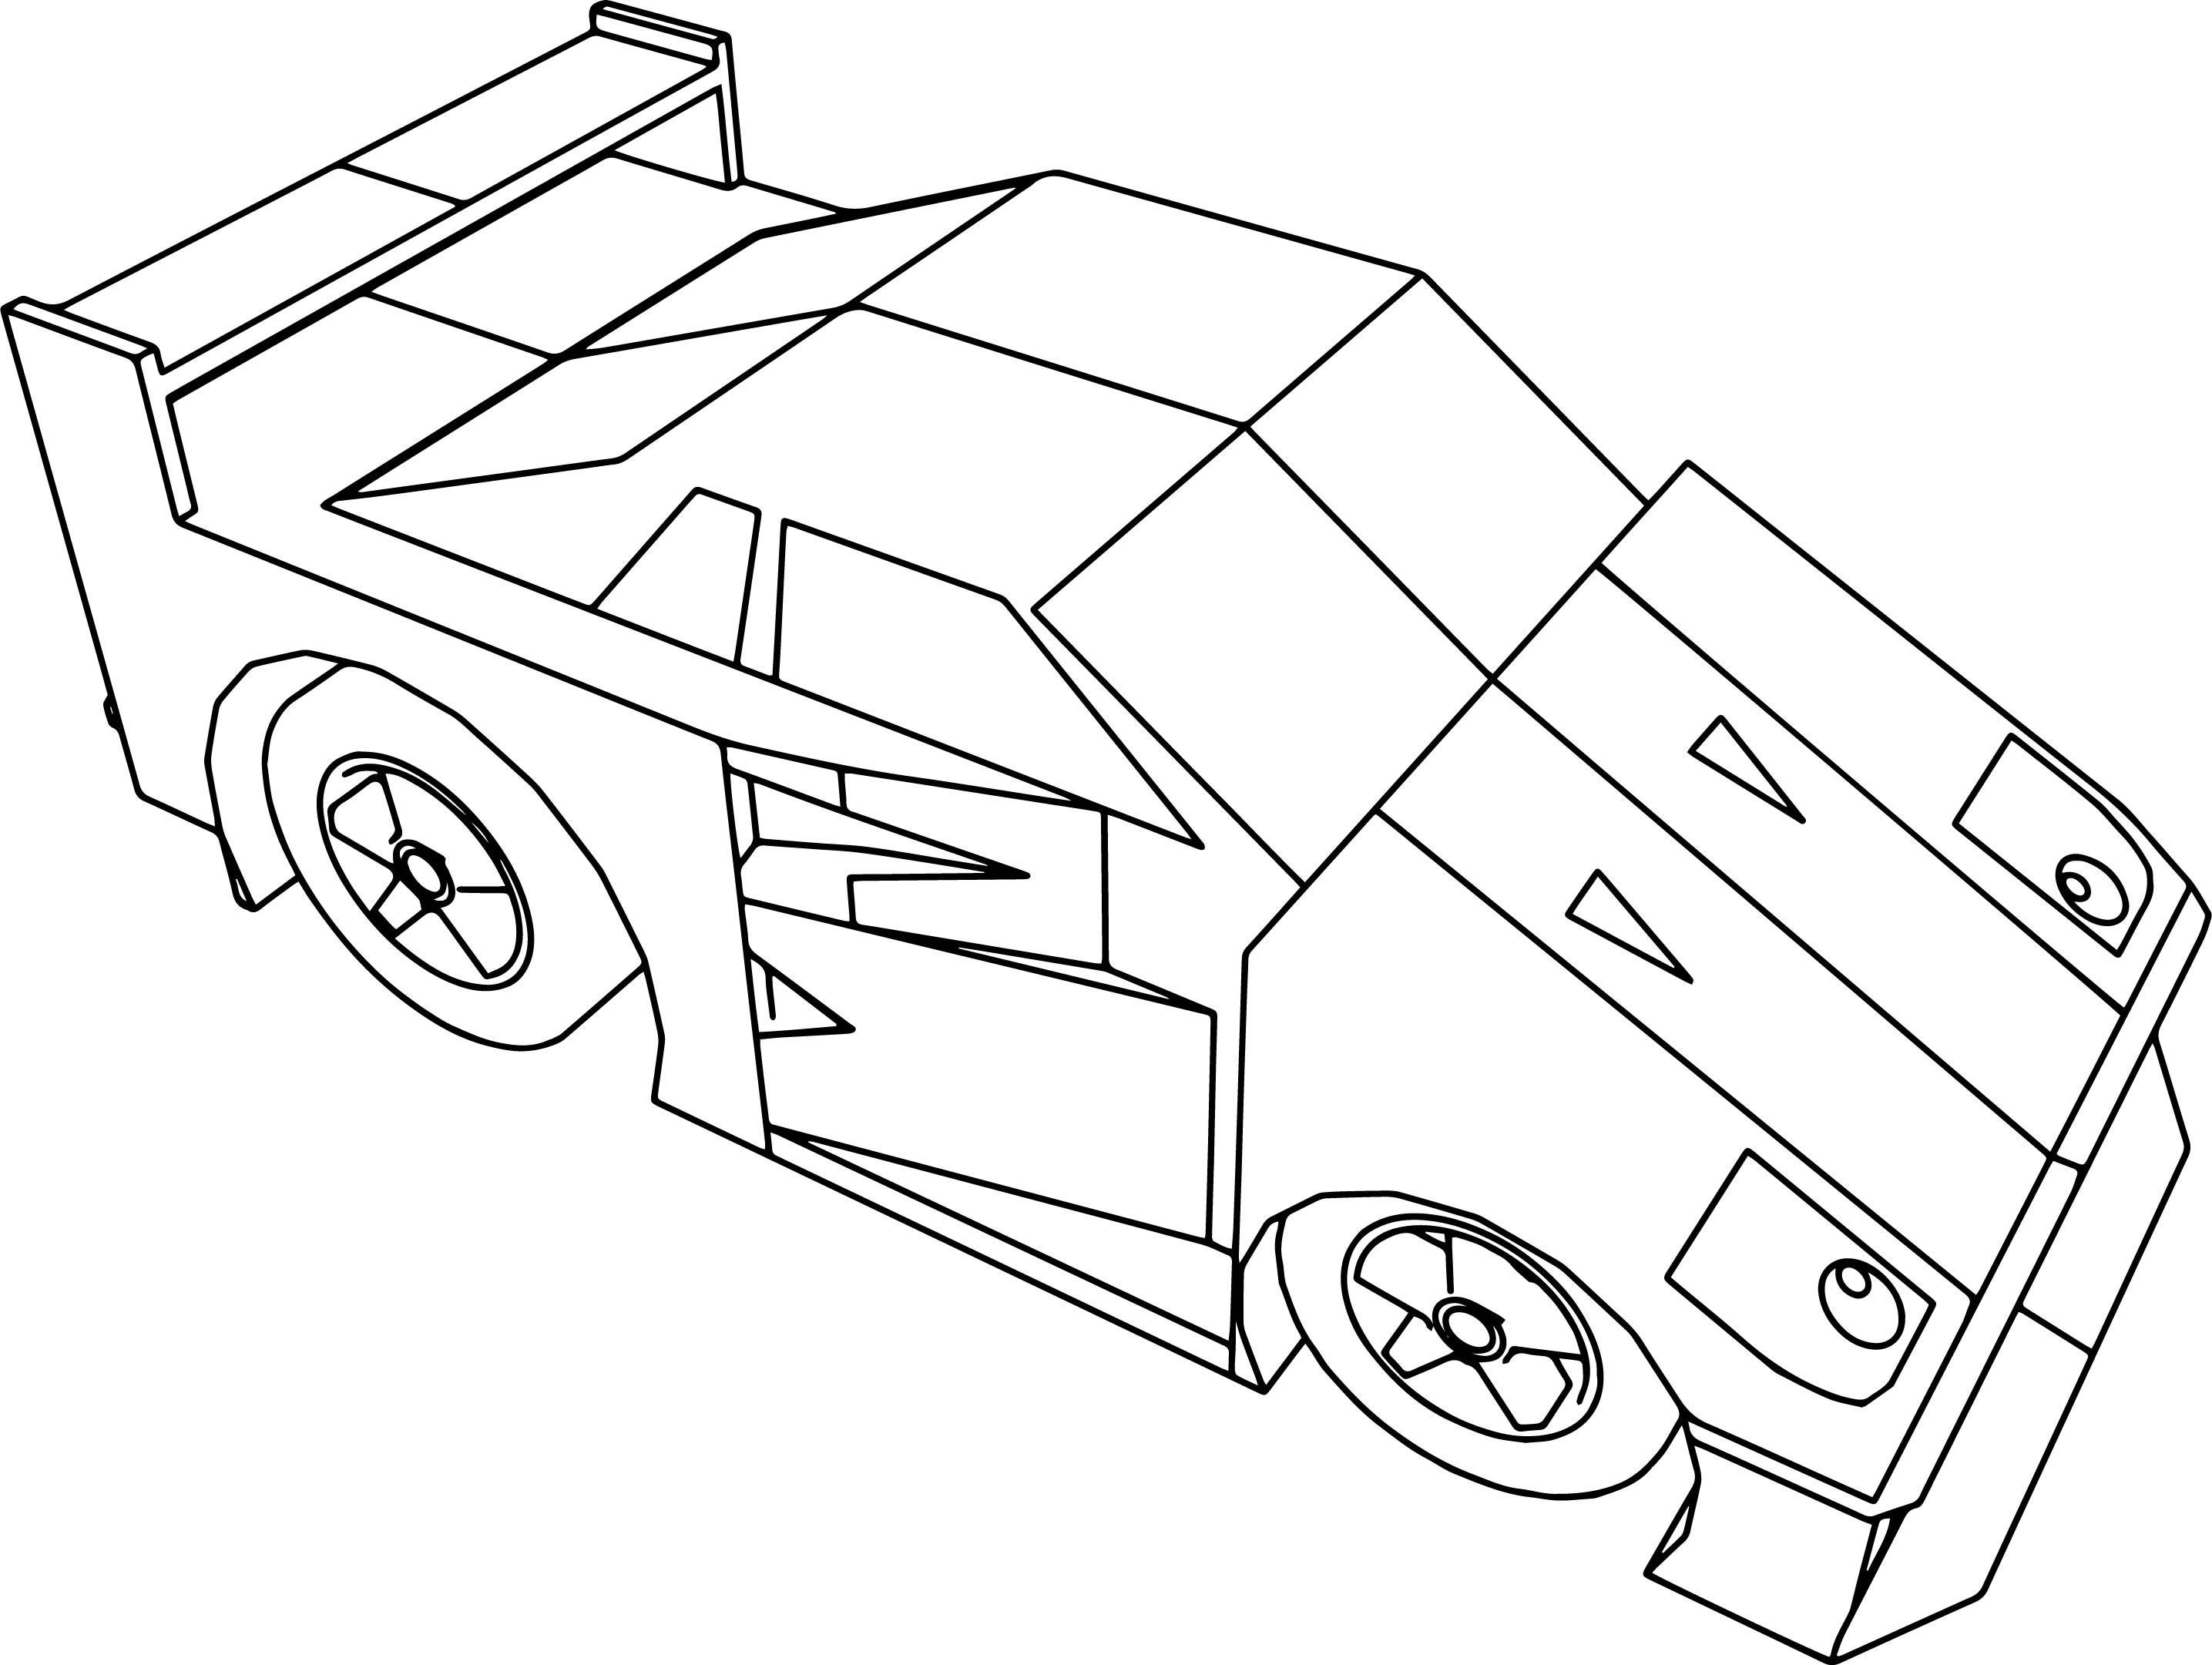 Ausmalbilder Autos Ferrari : Ferrari Drawing At Getdrawings Com Free For Personal Use Ferrari